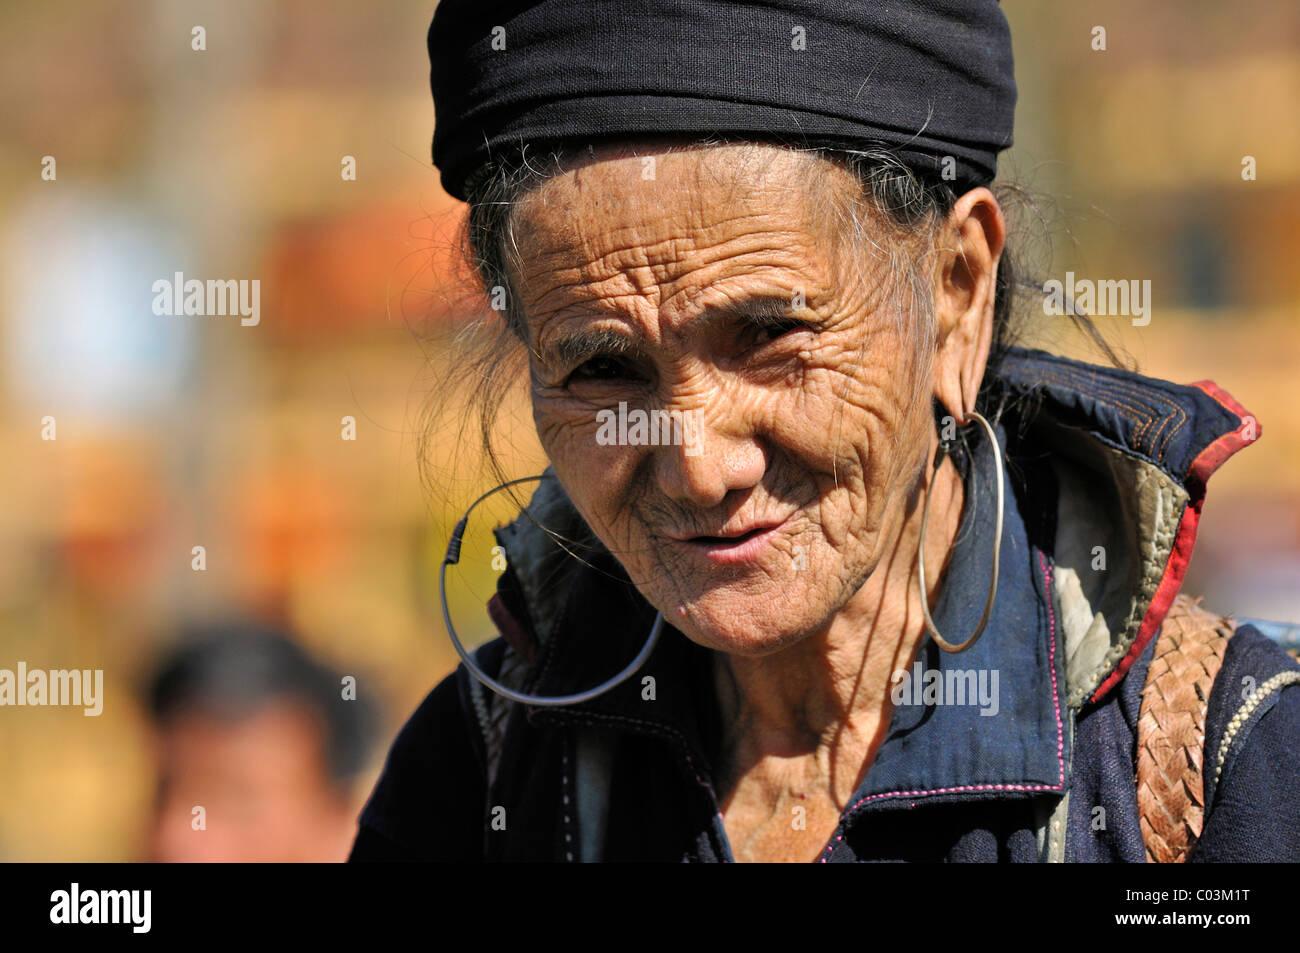 Woman at the market of Sa Pa or Sapa, Black Hmong ethnic minority group, North Vietnam, Vietnam, Asia - Stock Image